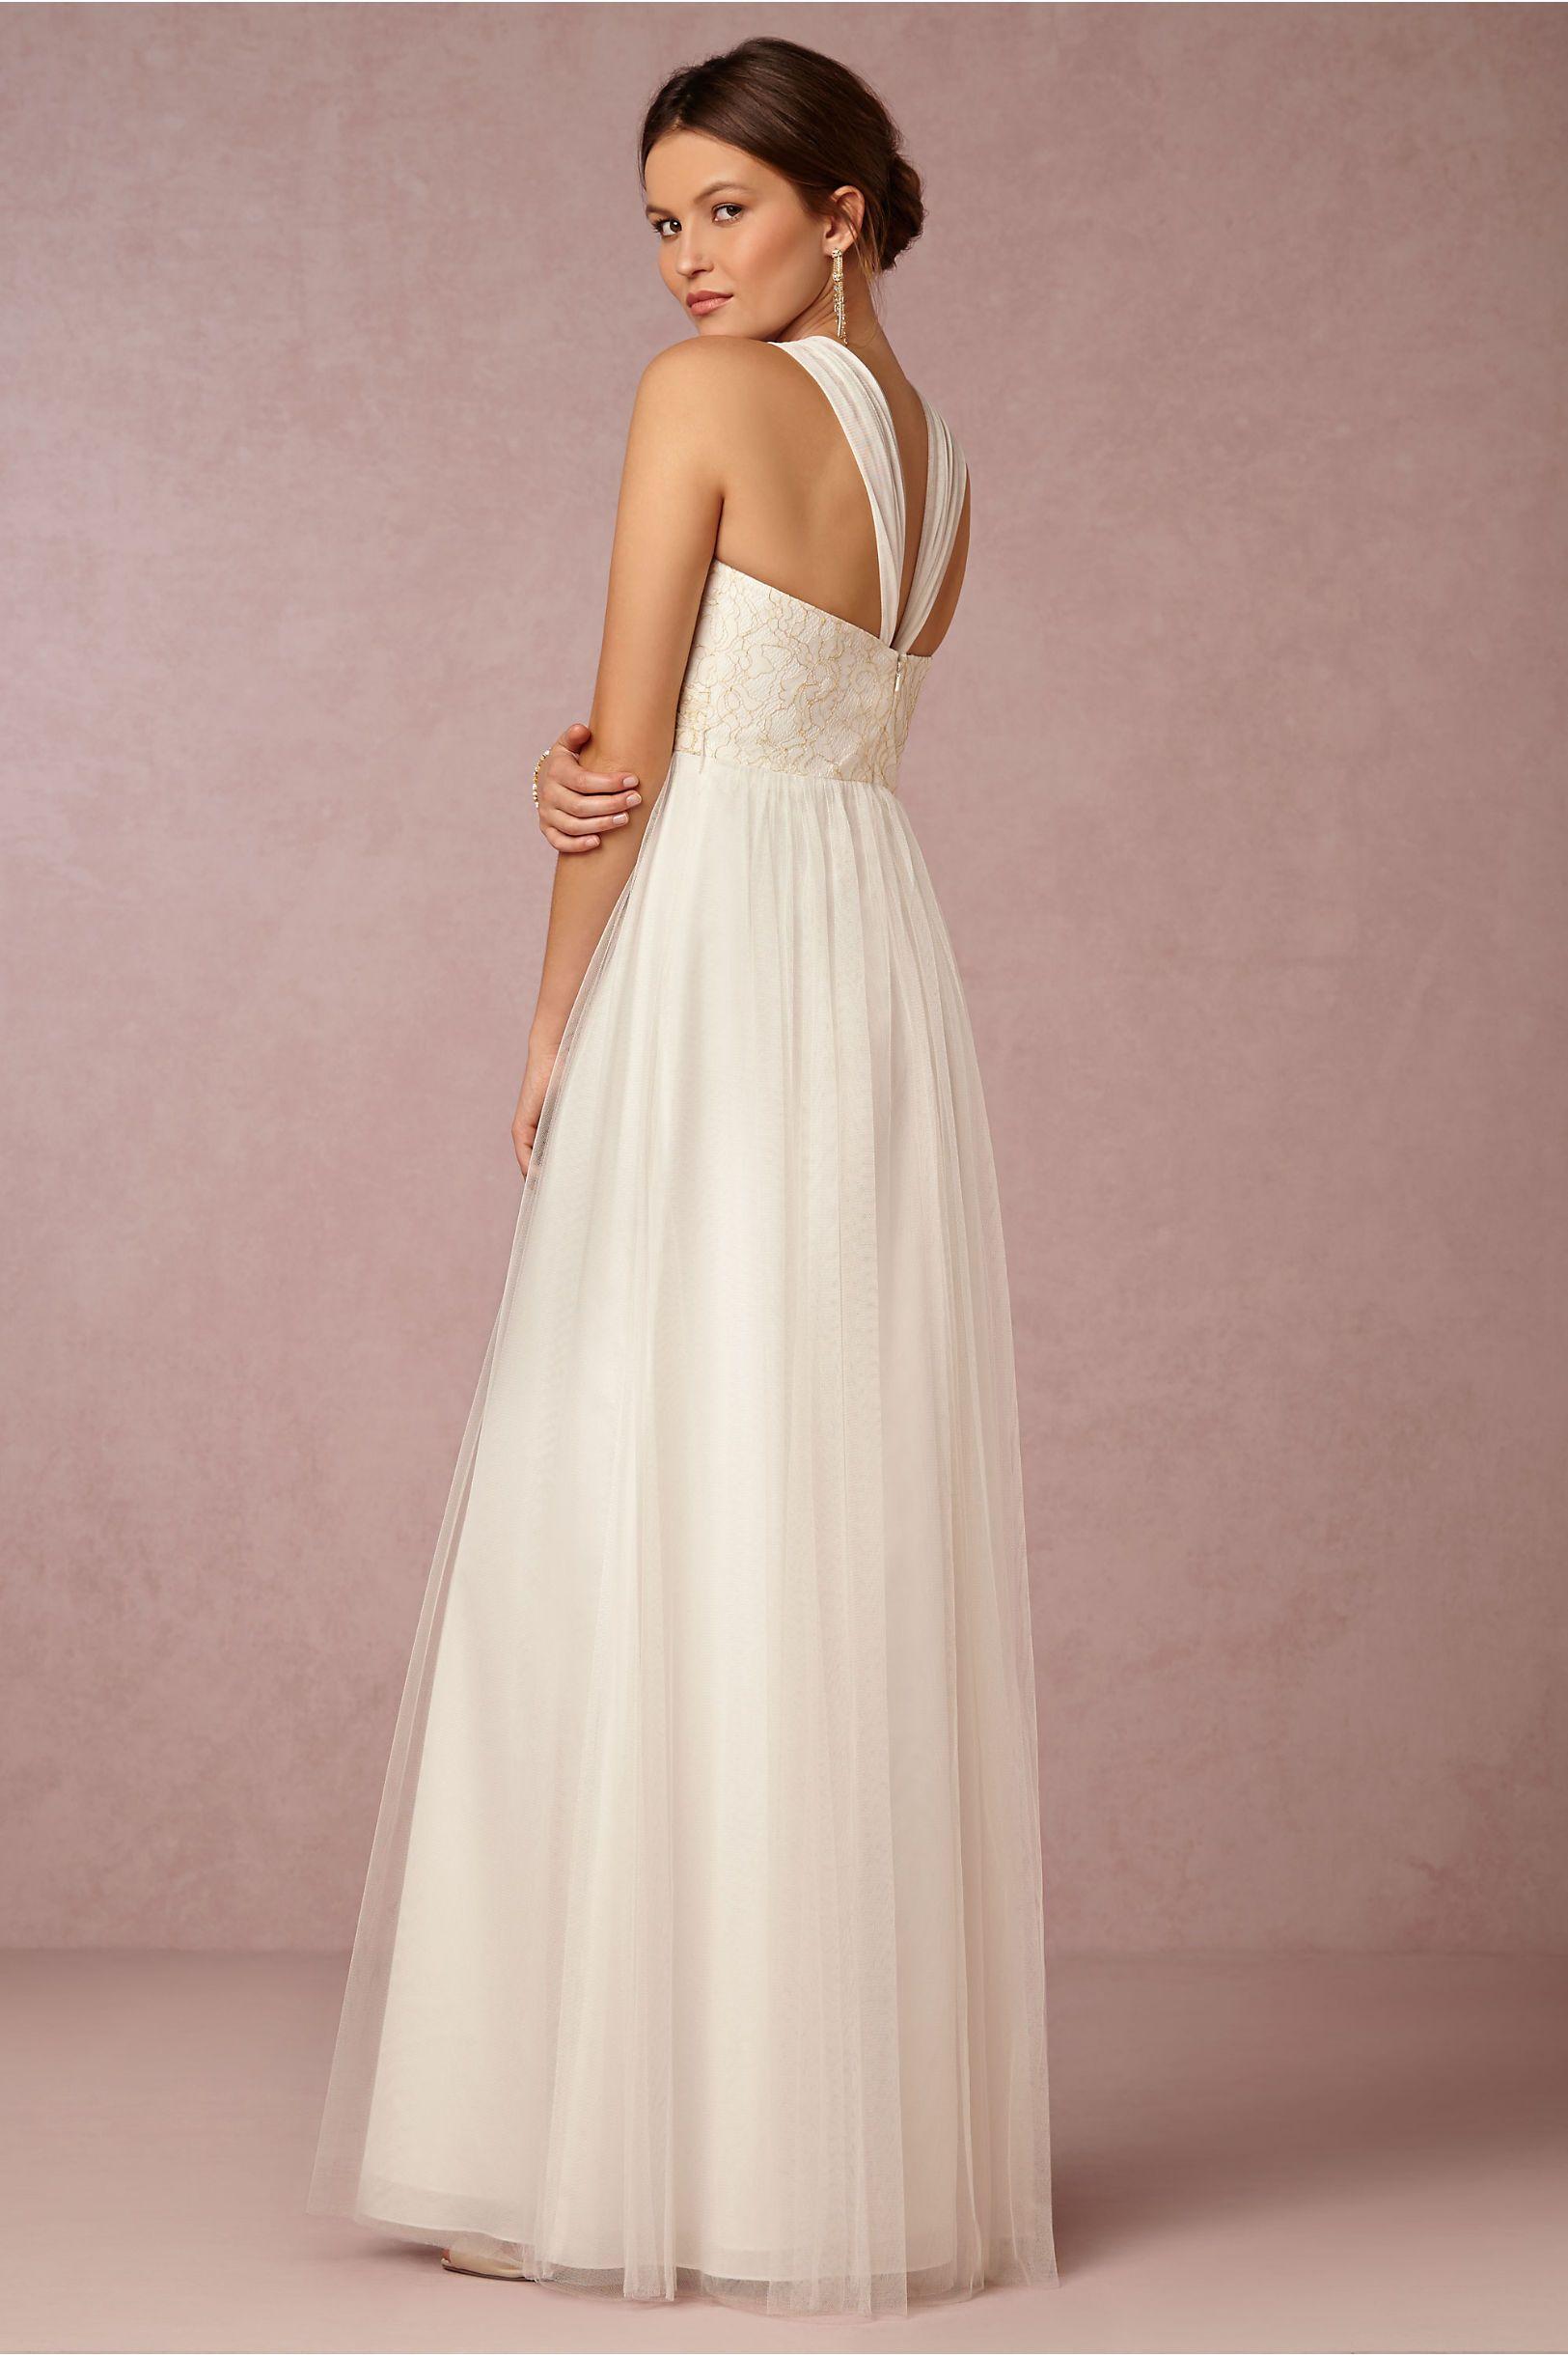 Long wedding reception dresses for the bride  Juliette Dress in Bride Wedding Dresses at BHLDN  Dresspiration